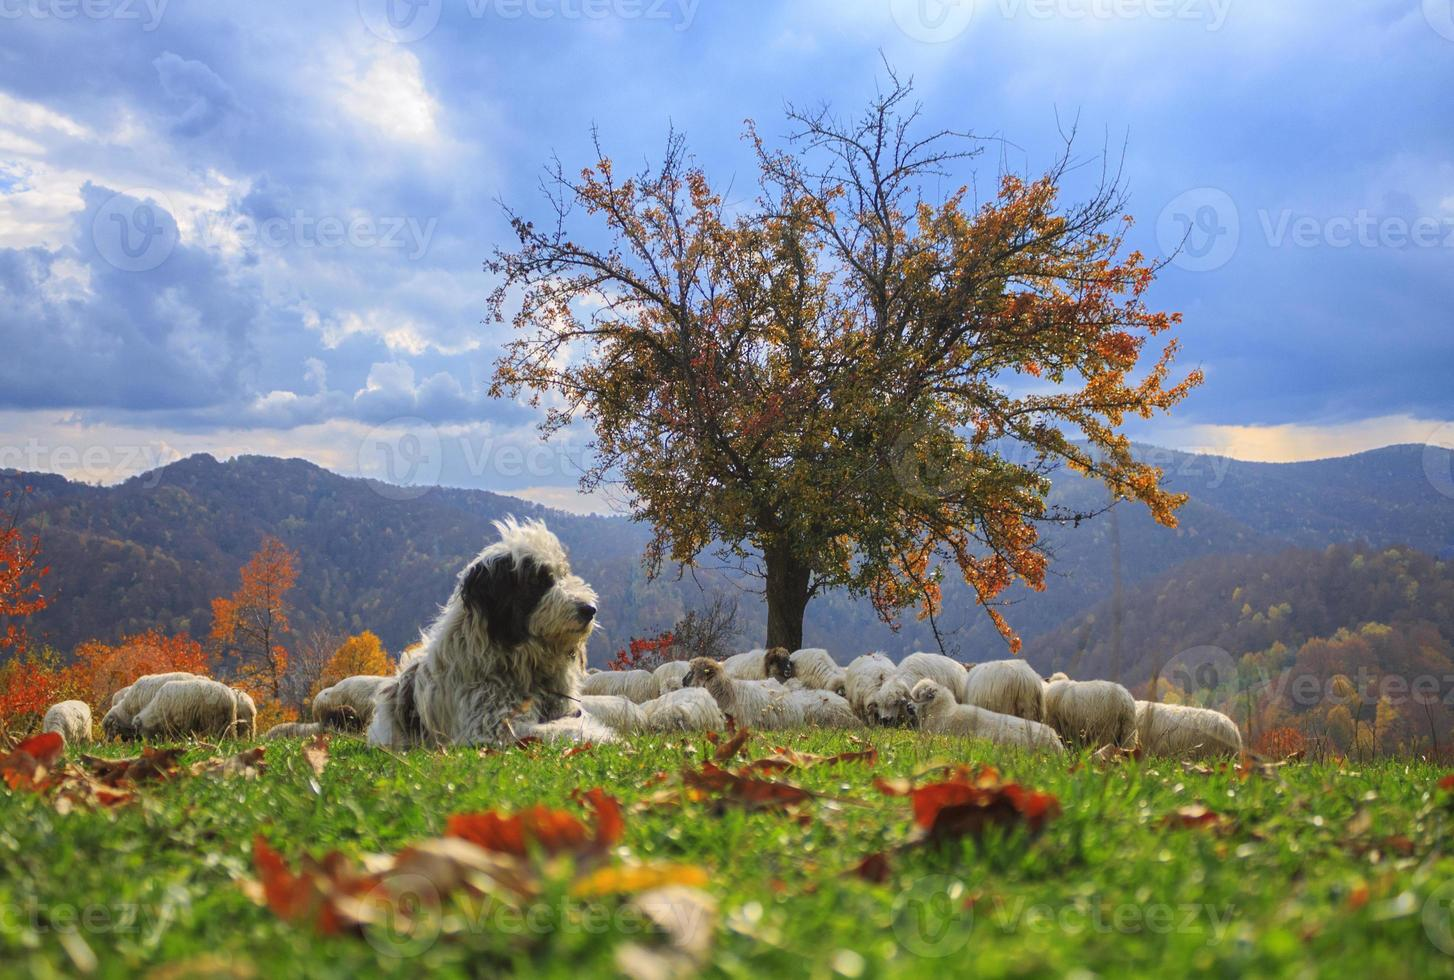 cordeiros no outono foto